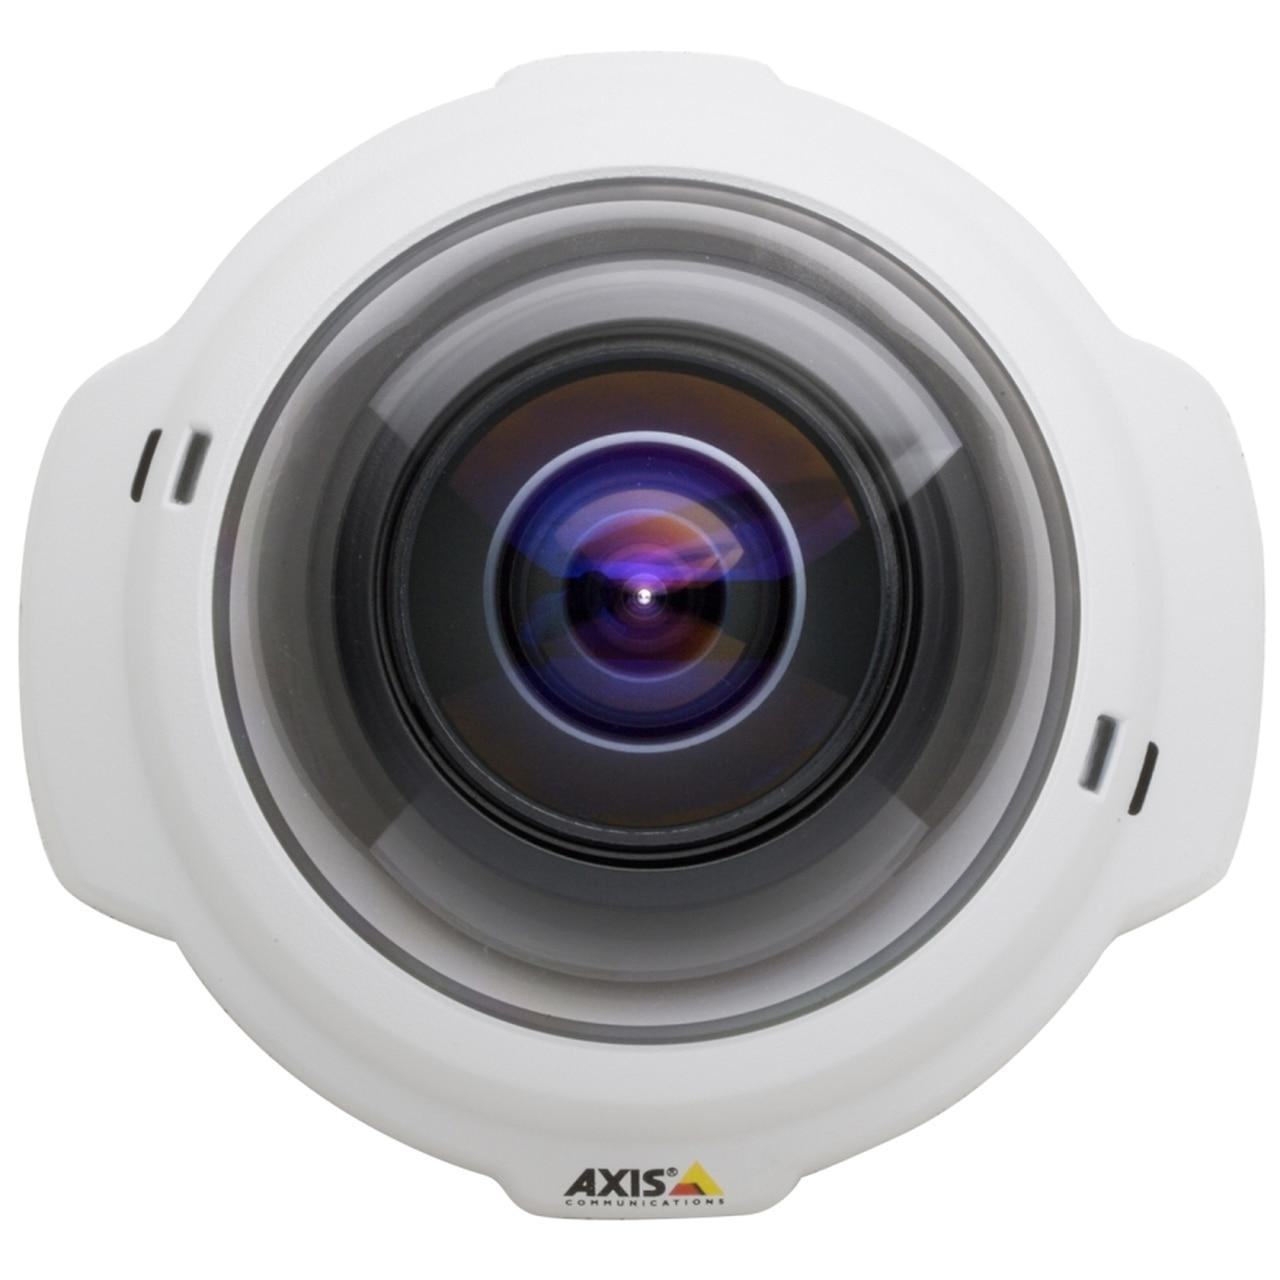 Axis 212 PTZ P/N 0257-001-04 Camcorder - White